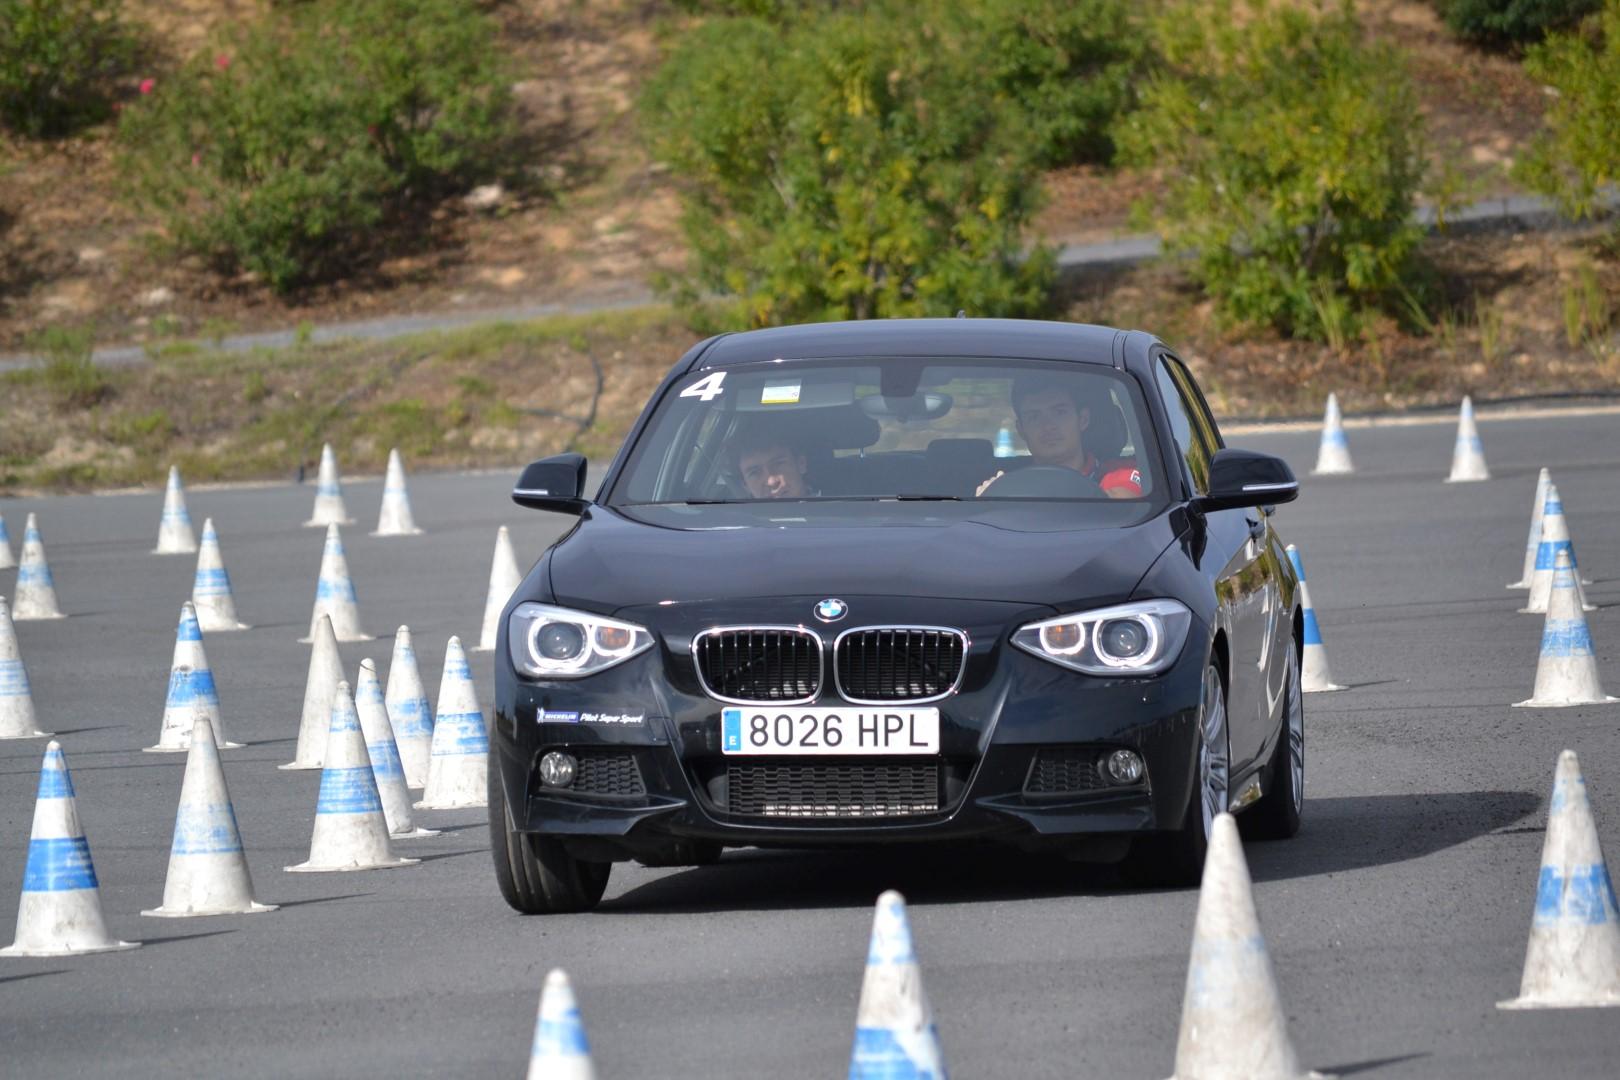 13-11-10 BMW 100 (Large)